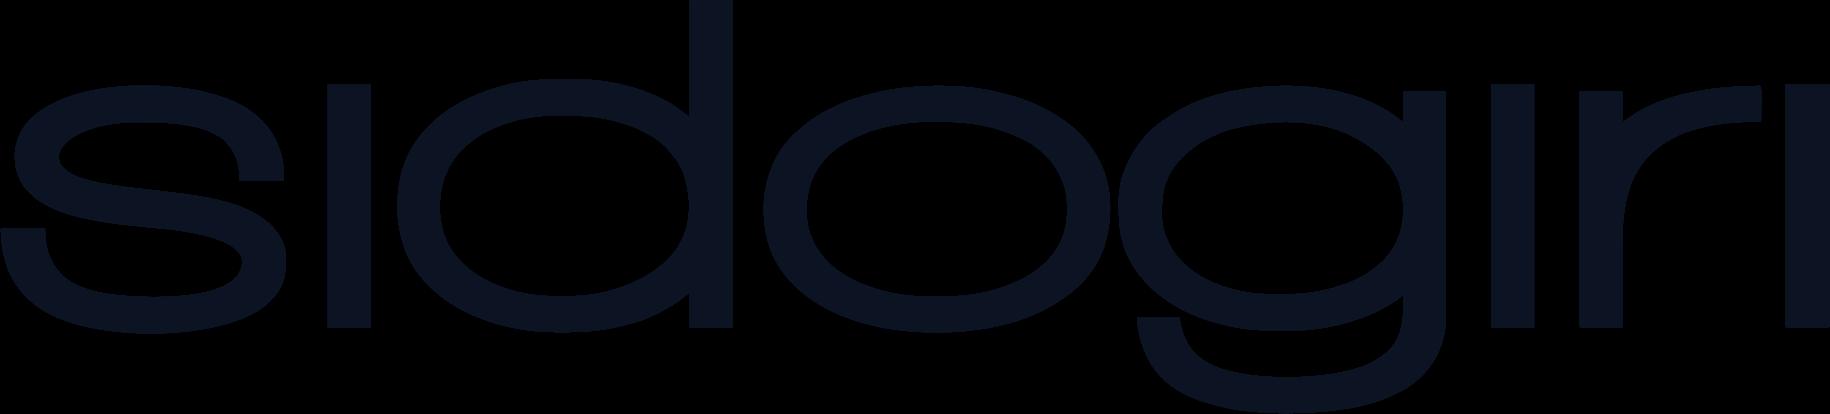 Logo sidogiri media - hitam